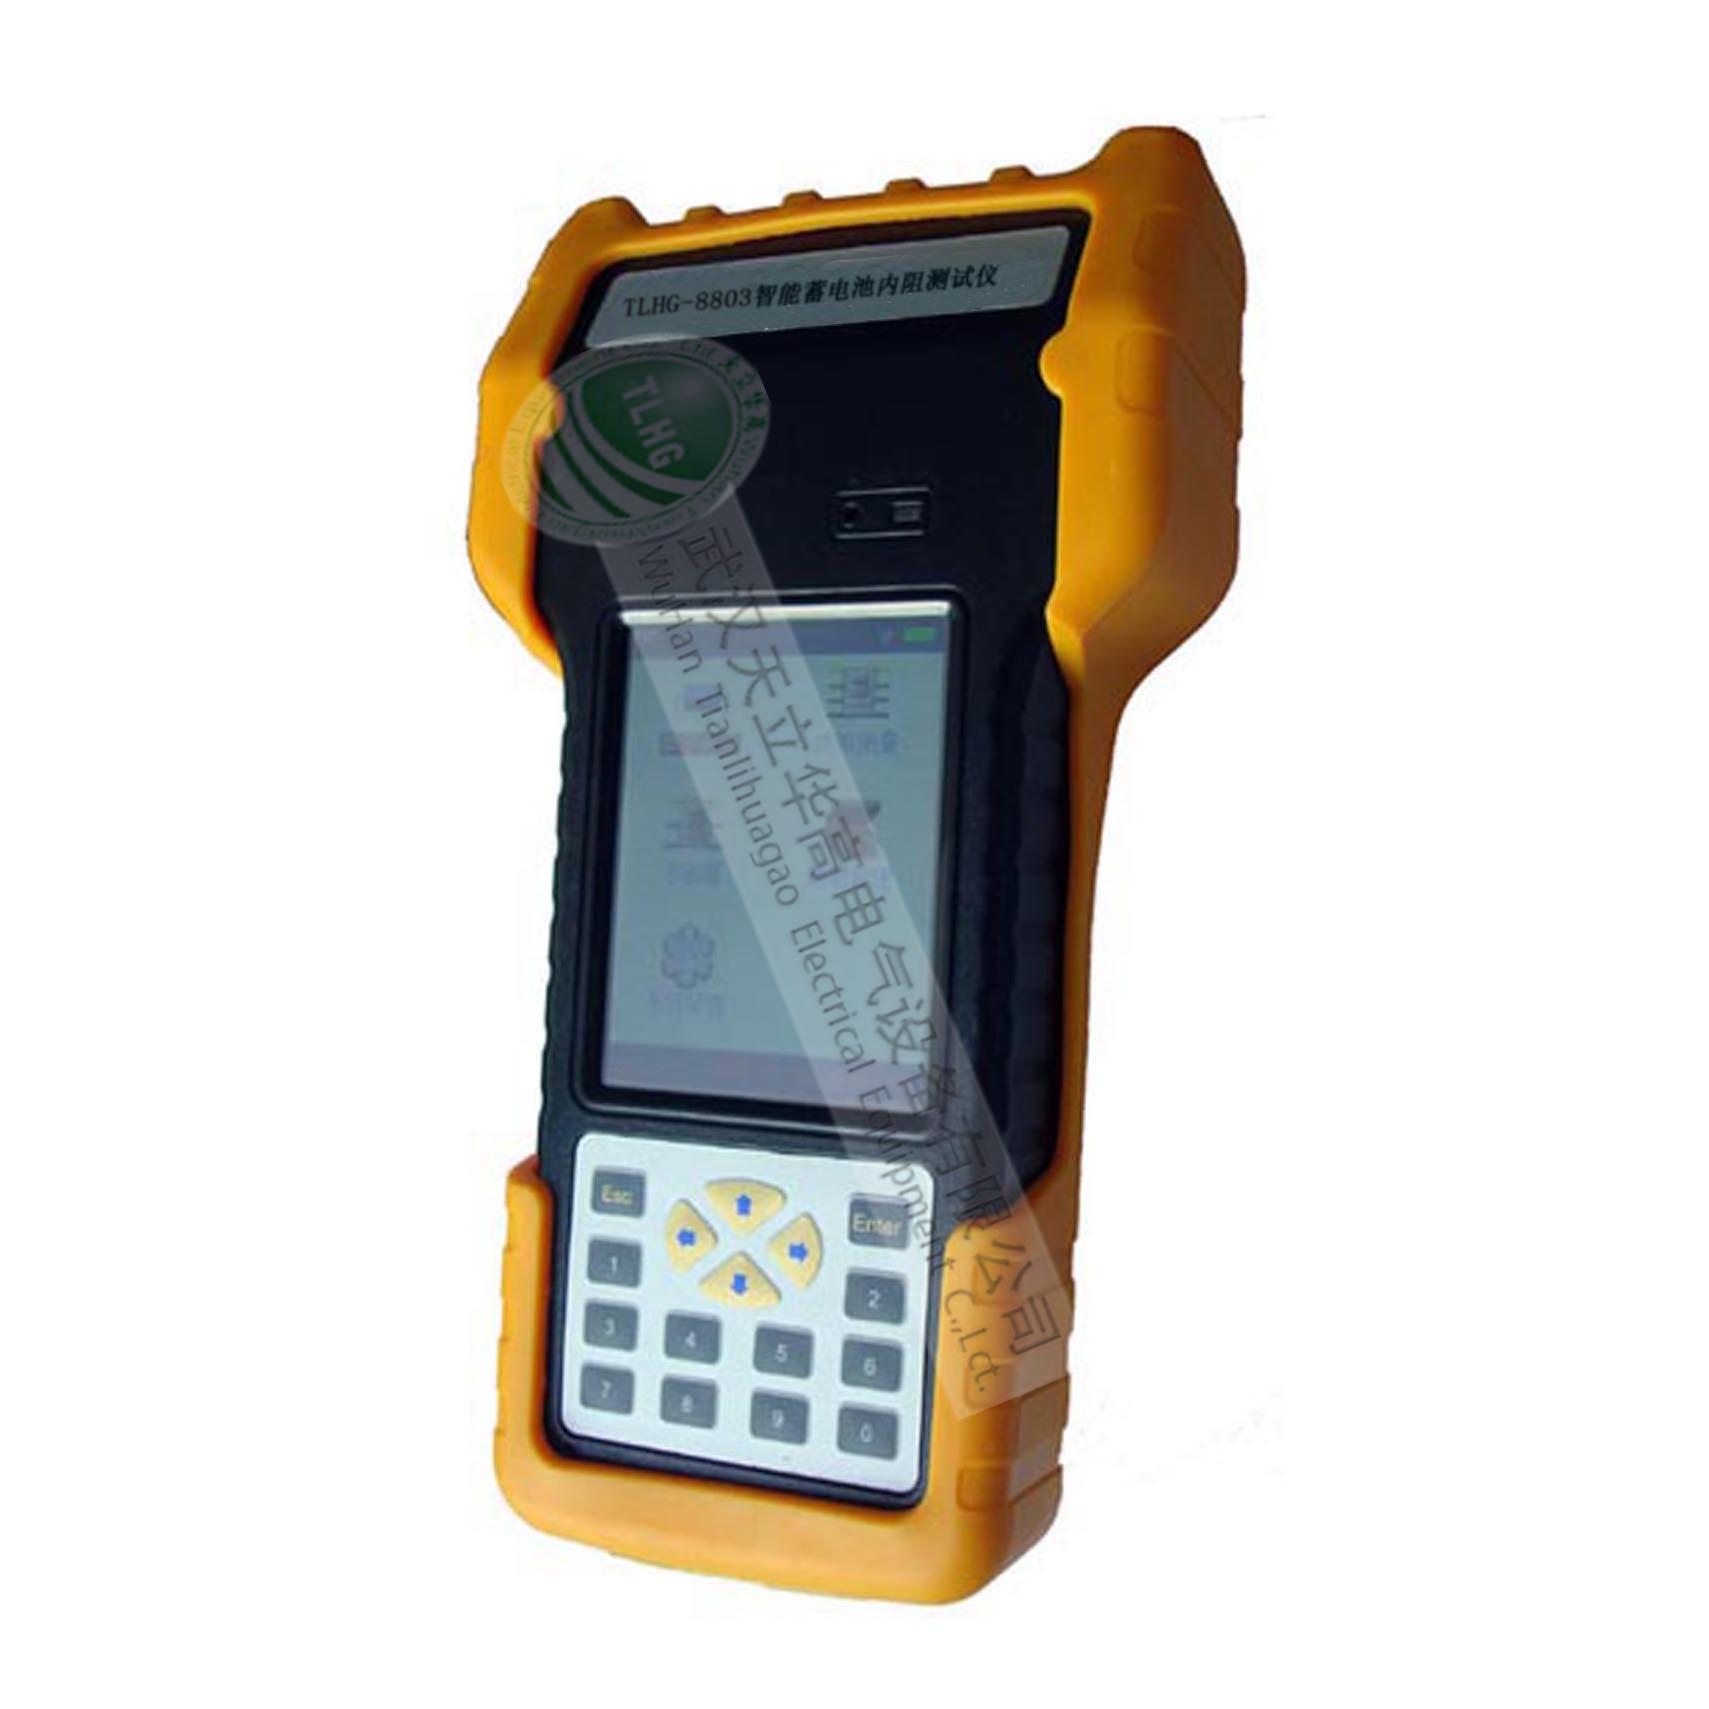 TLHG-8803智能蓄电池内阻bob综合app手机客户端